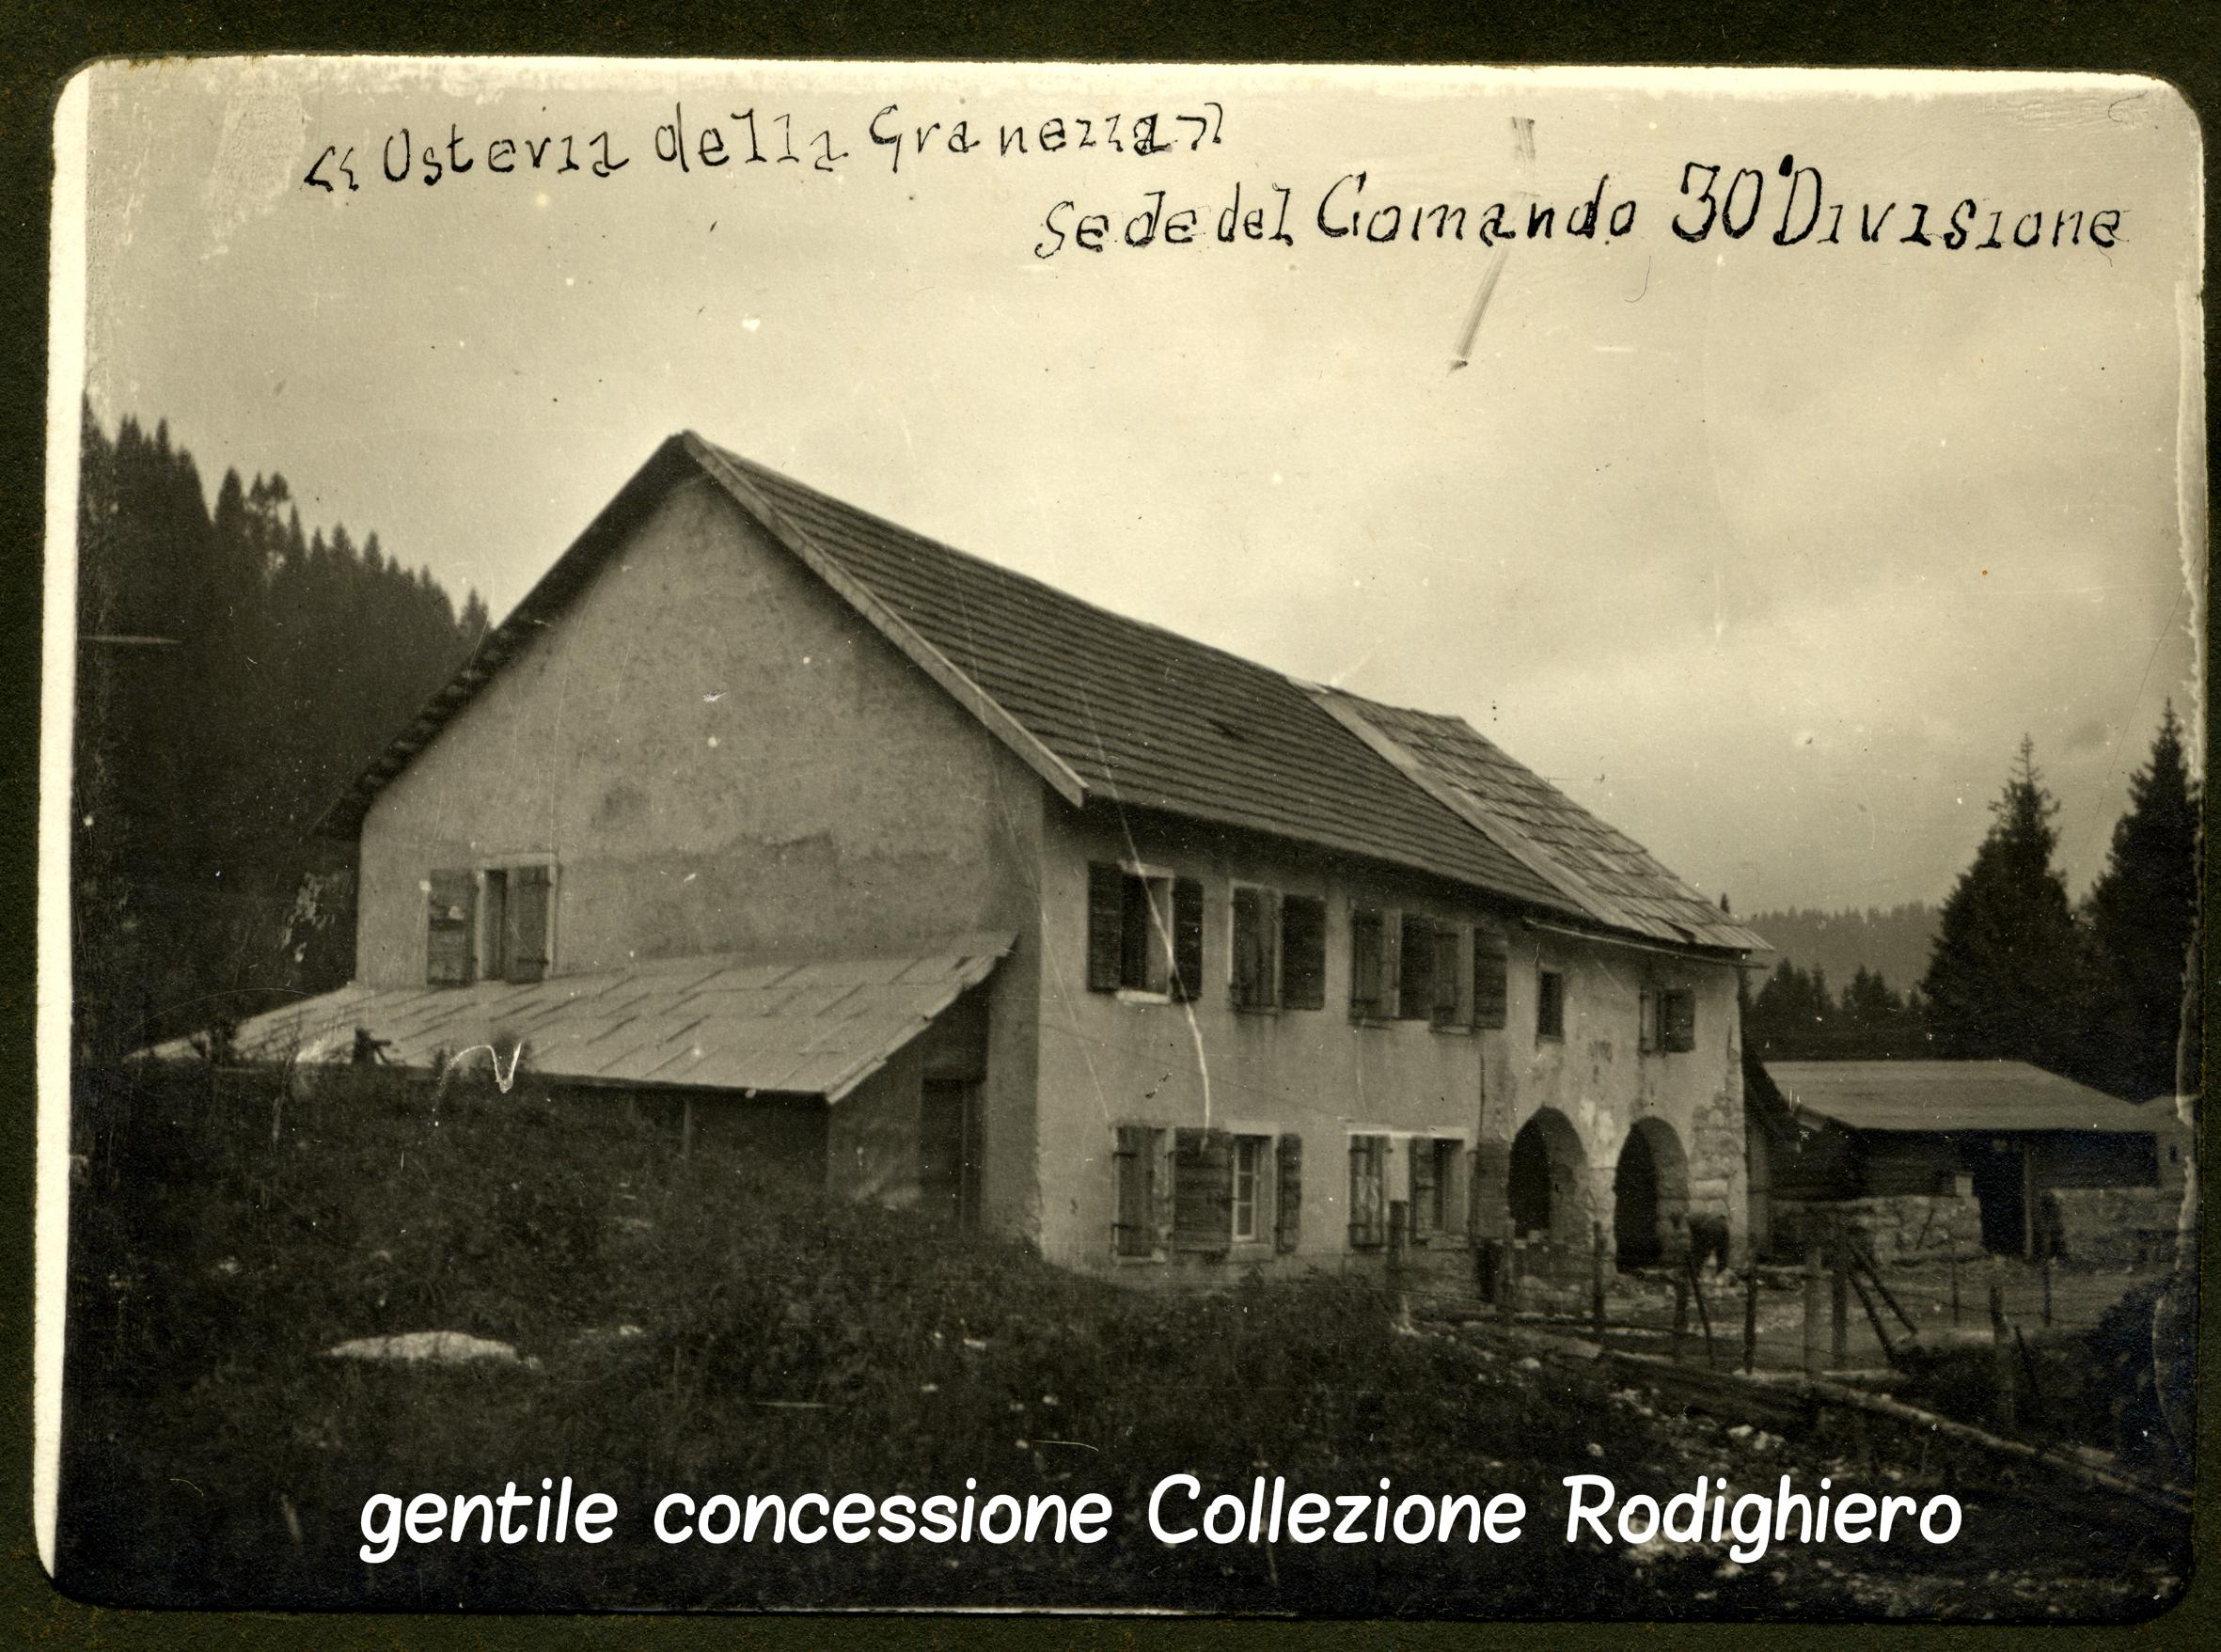 04 - l'osteria di Granezza - (ASDM - coll rodighiero) (c).jpg